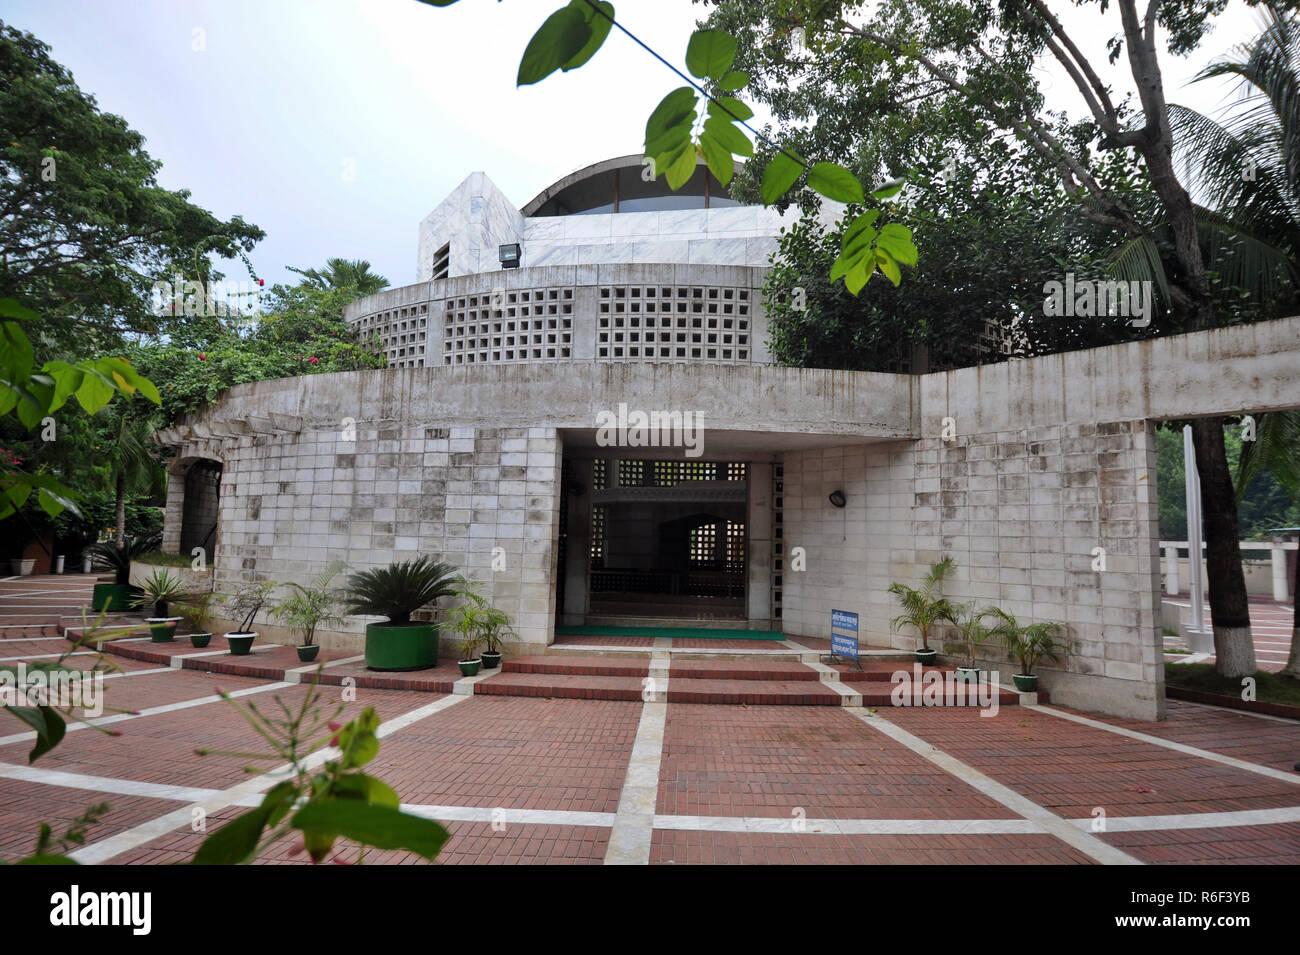 Gopalganj, Bangladesh - October 01, 2013: Mausoleum of father of the nation Bangabandhu Sheikh Mujibur Rahman at Tungipara in Gopalganj, Bangladesh. - Stock Image